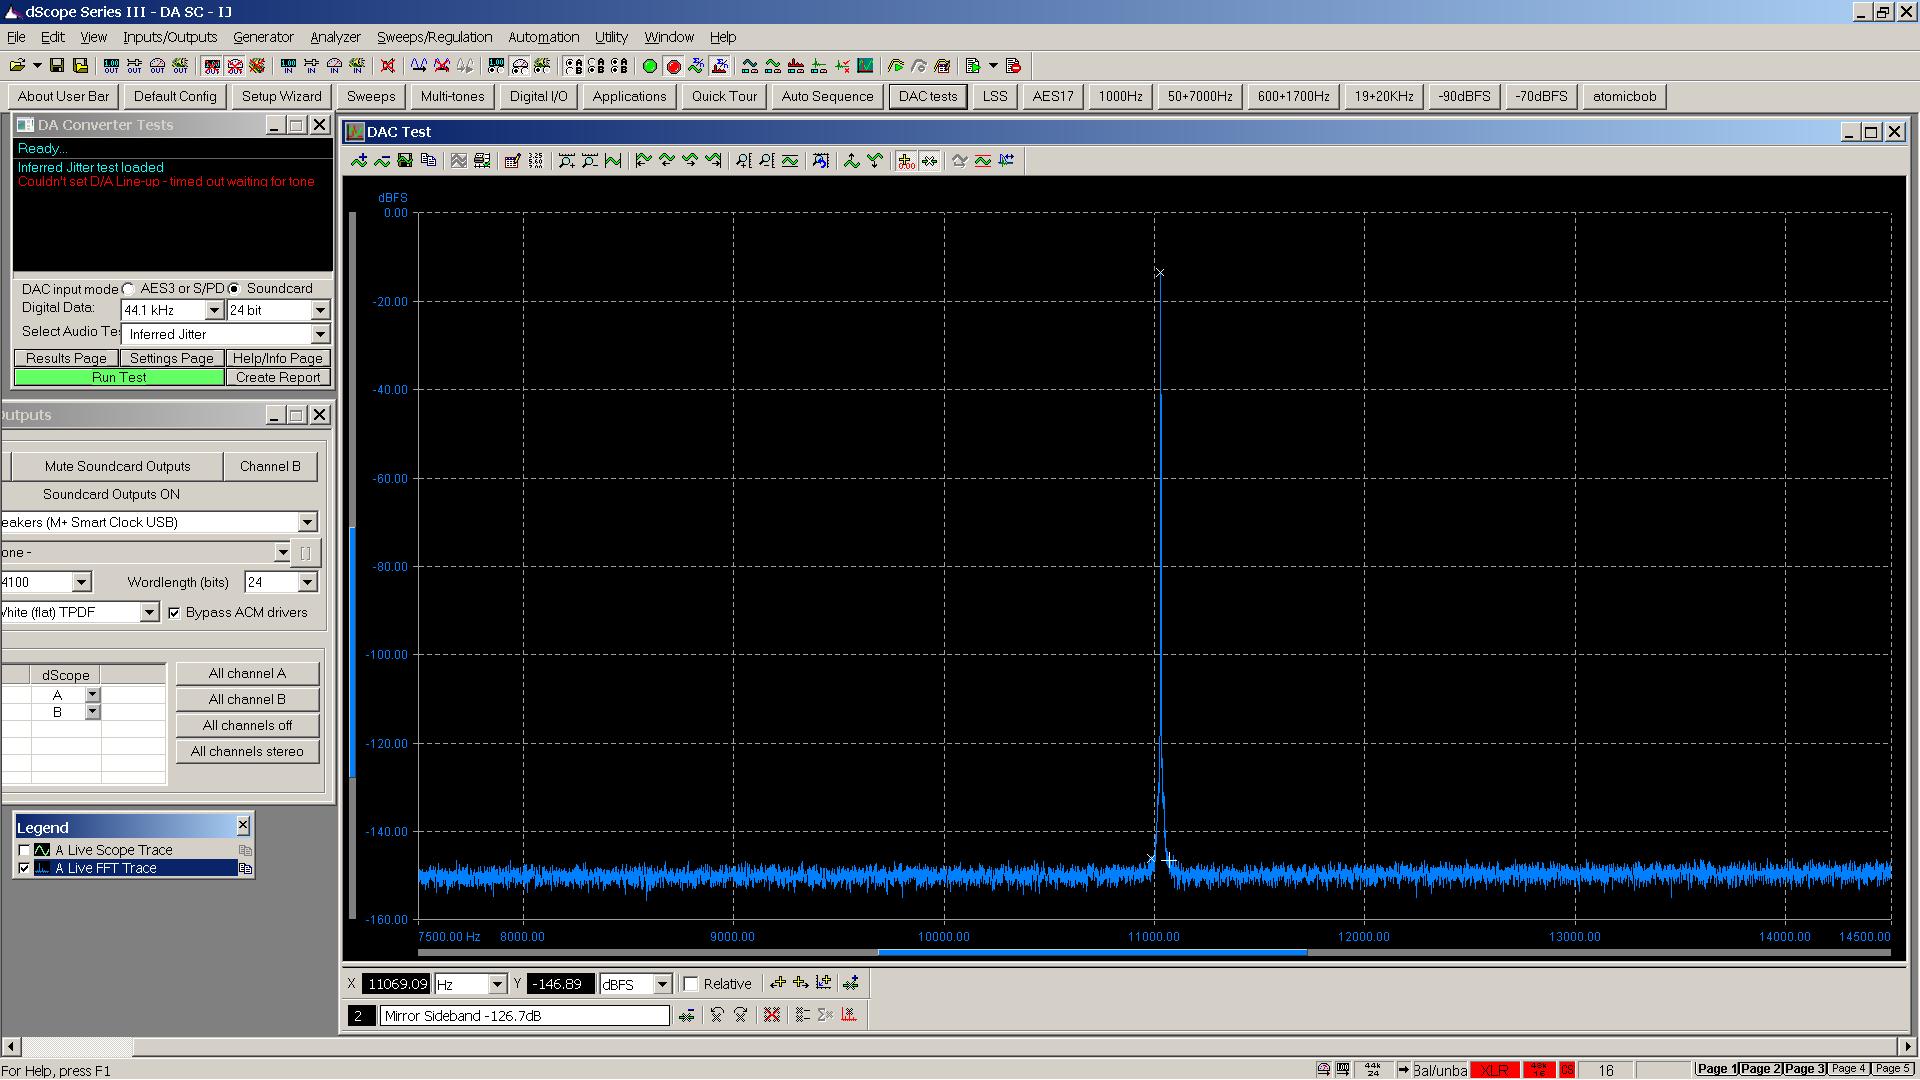 04 20180727-03 Modi MB SE inferred jitter - 7 KHz BW - MC-3+ + LiveClock + FS725.PNG